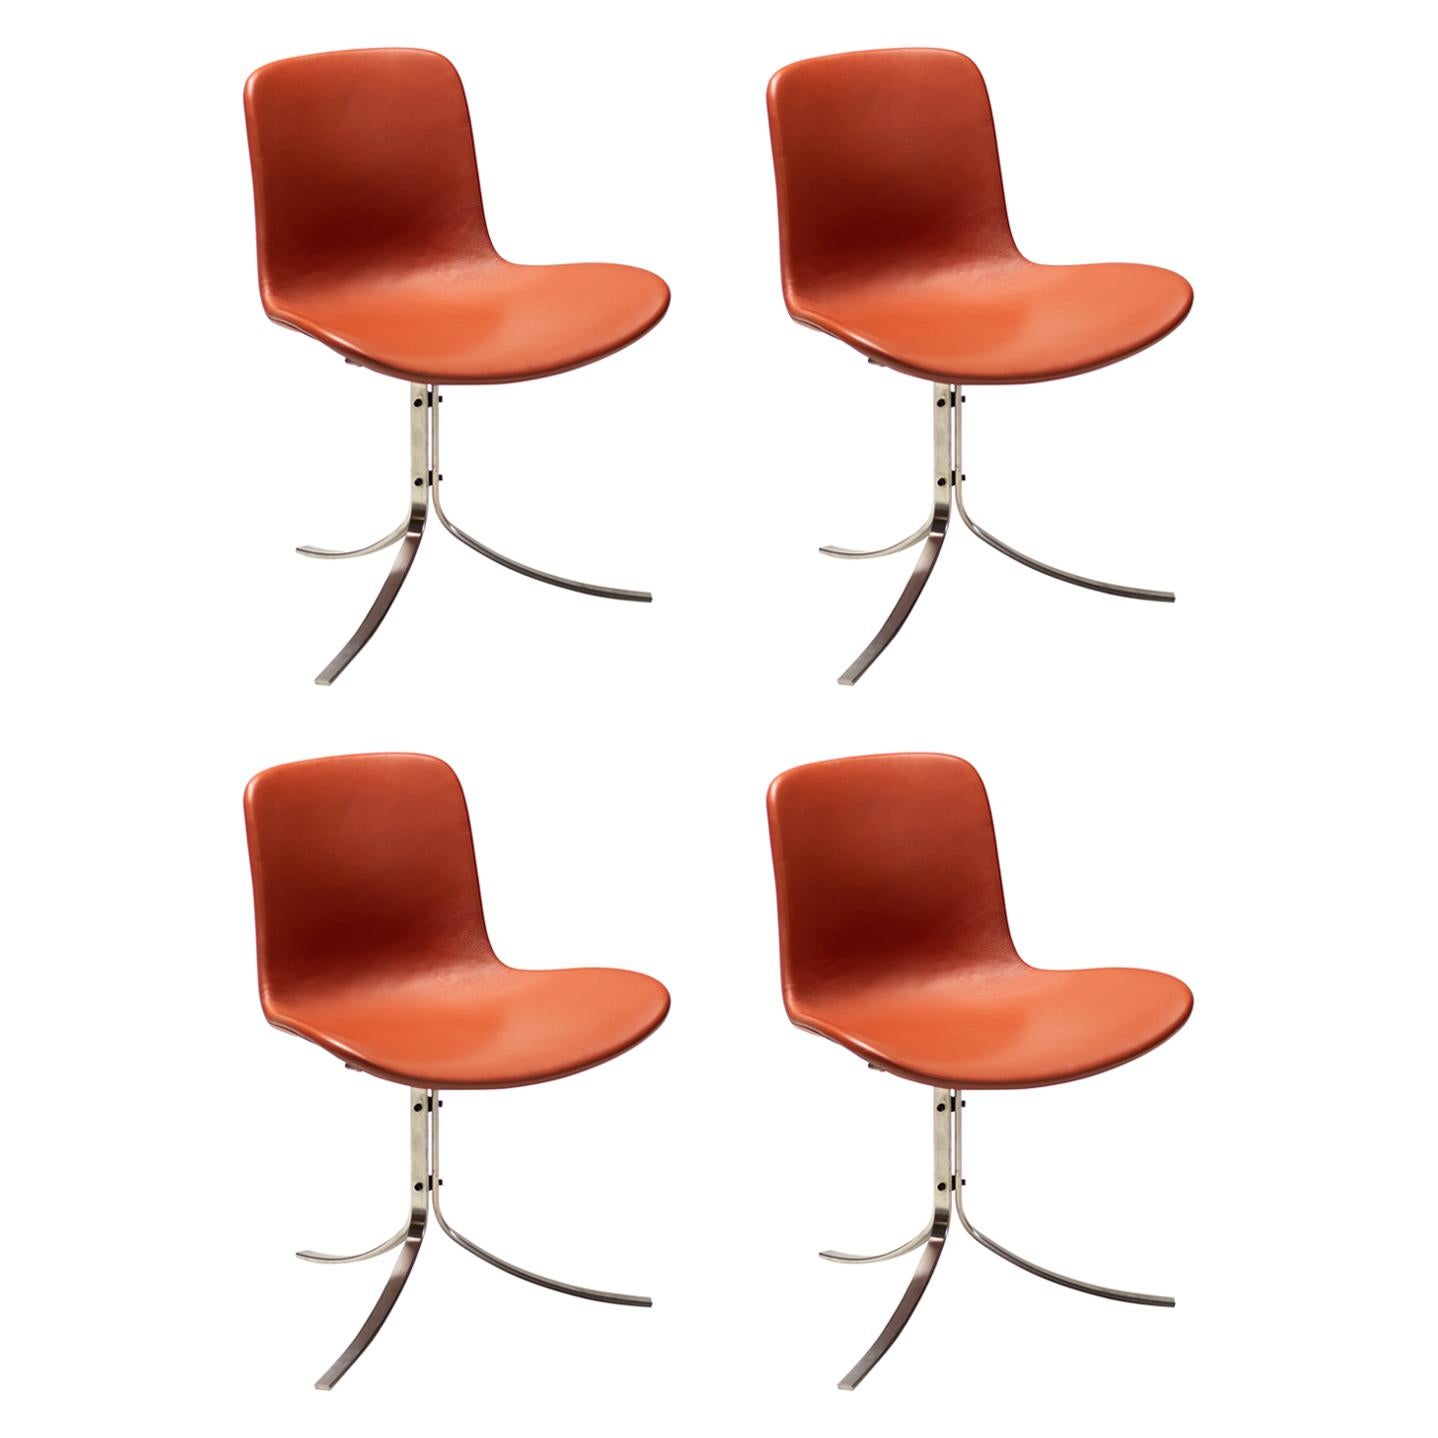 Set of Four PK9 Chairs by Poul Kjaerholm for Fritz Hansen